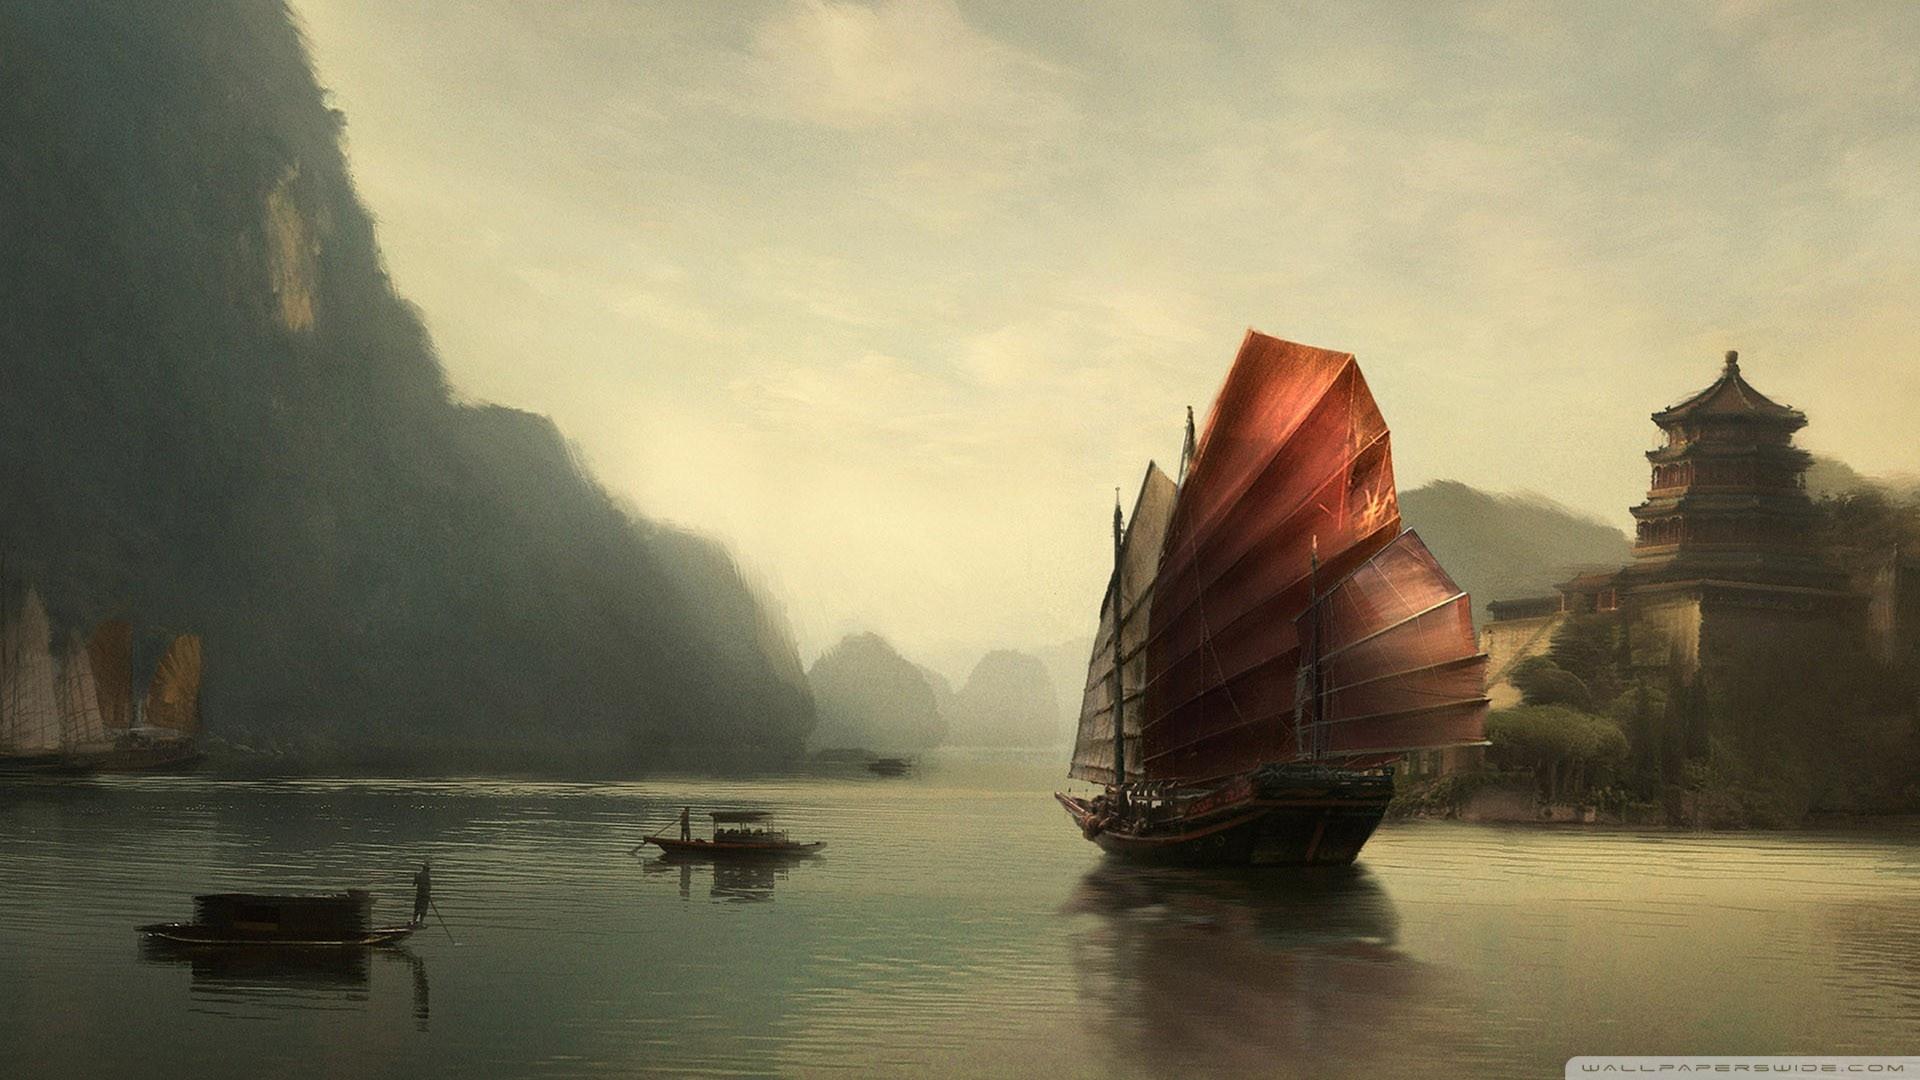 junk-ship-chinese-painting_00450704.jpg